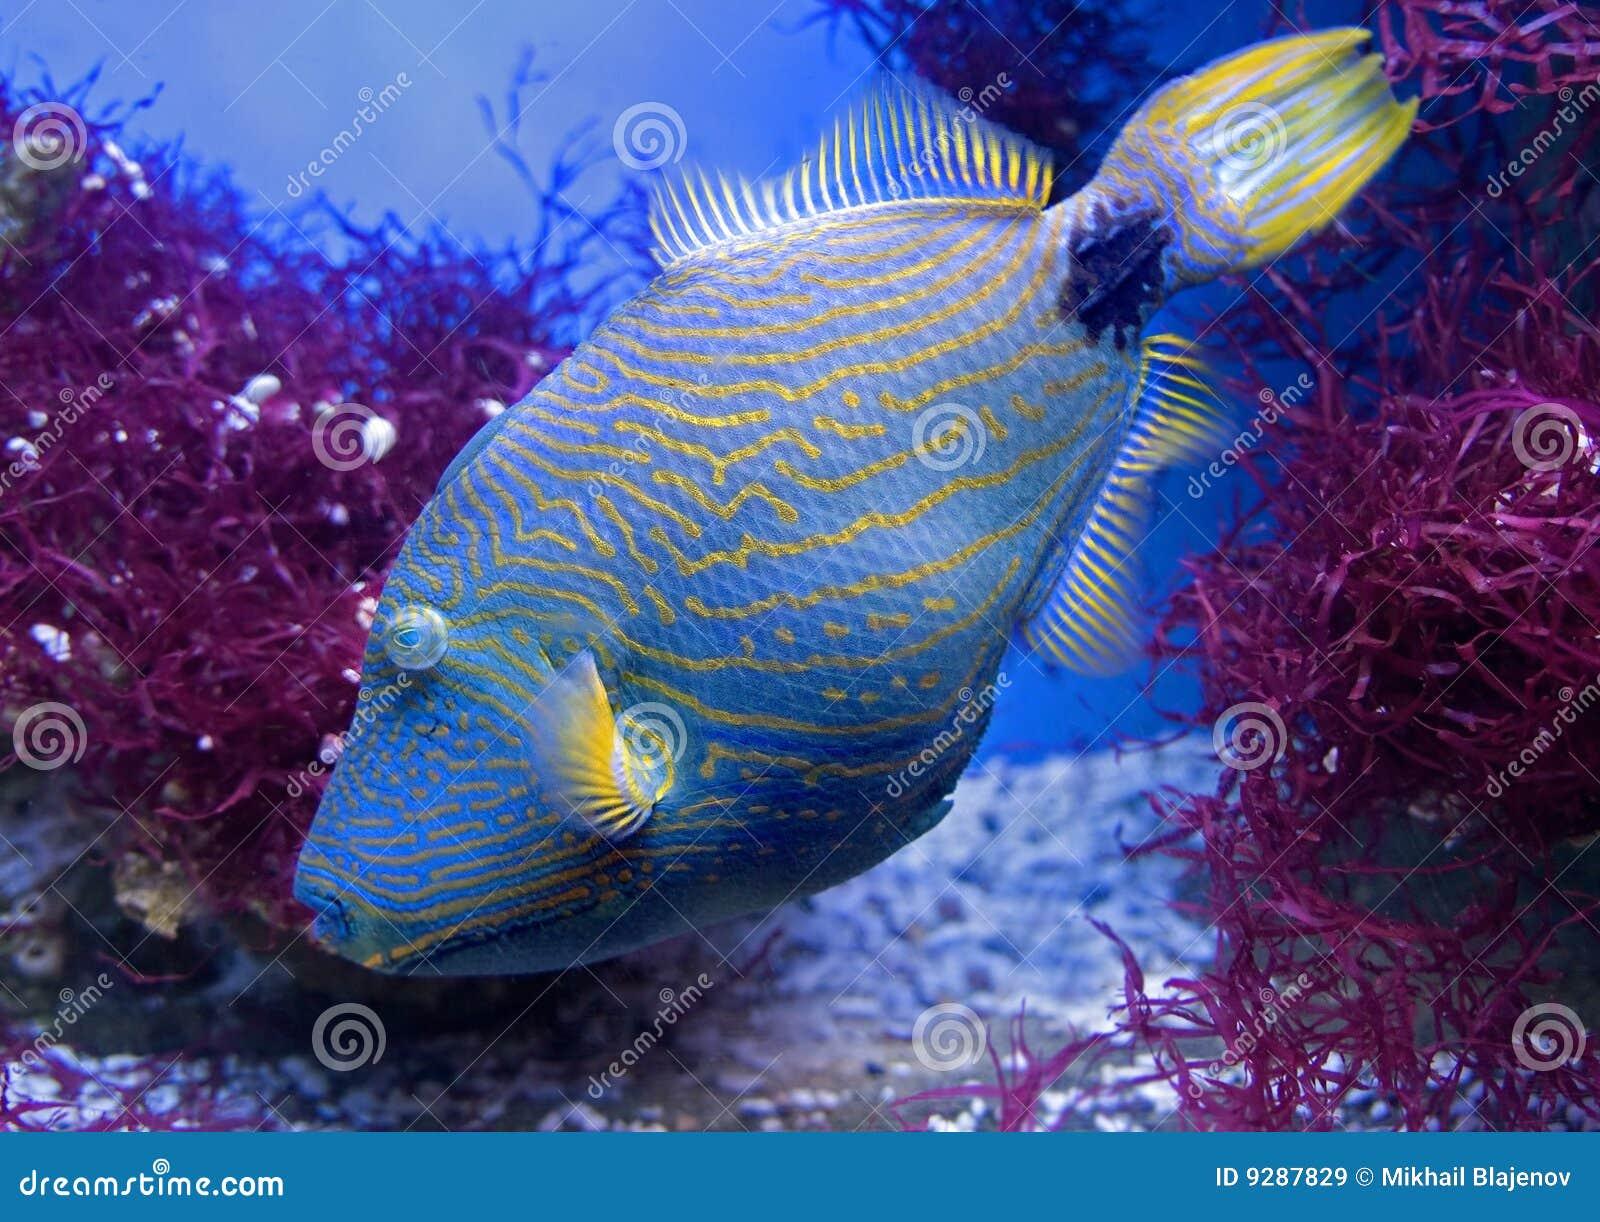 Undulate triggerfish 1Undulate Triggerfish